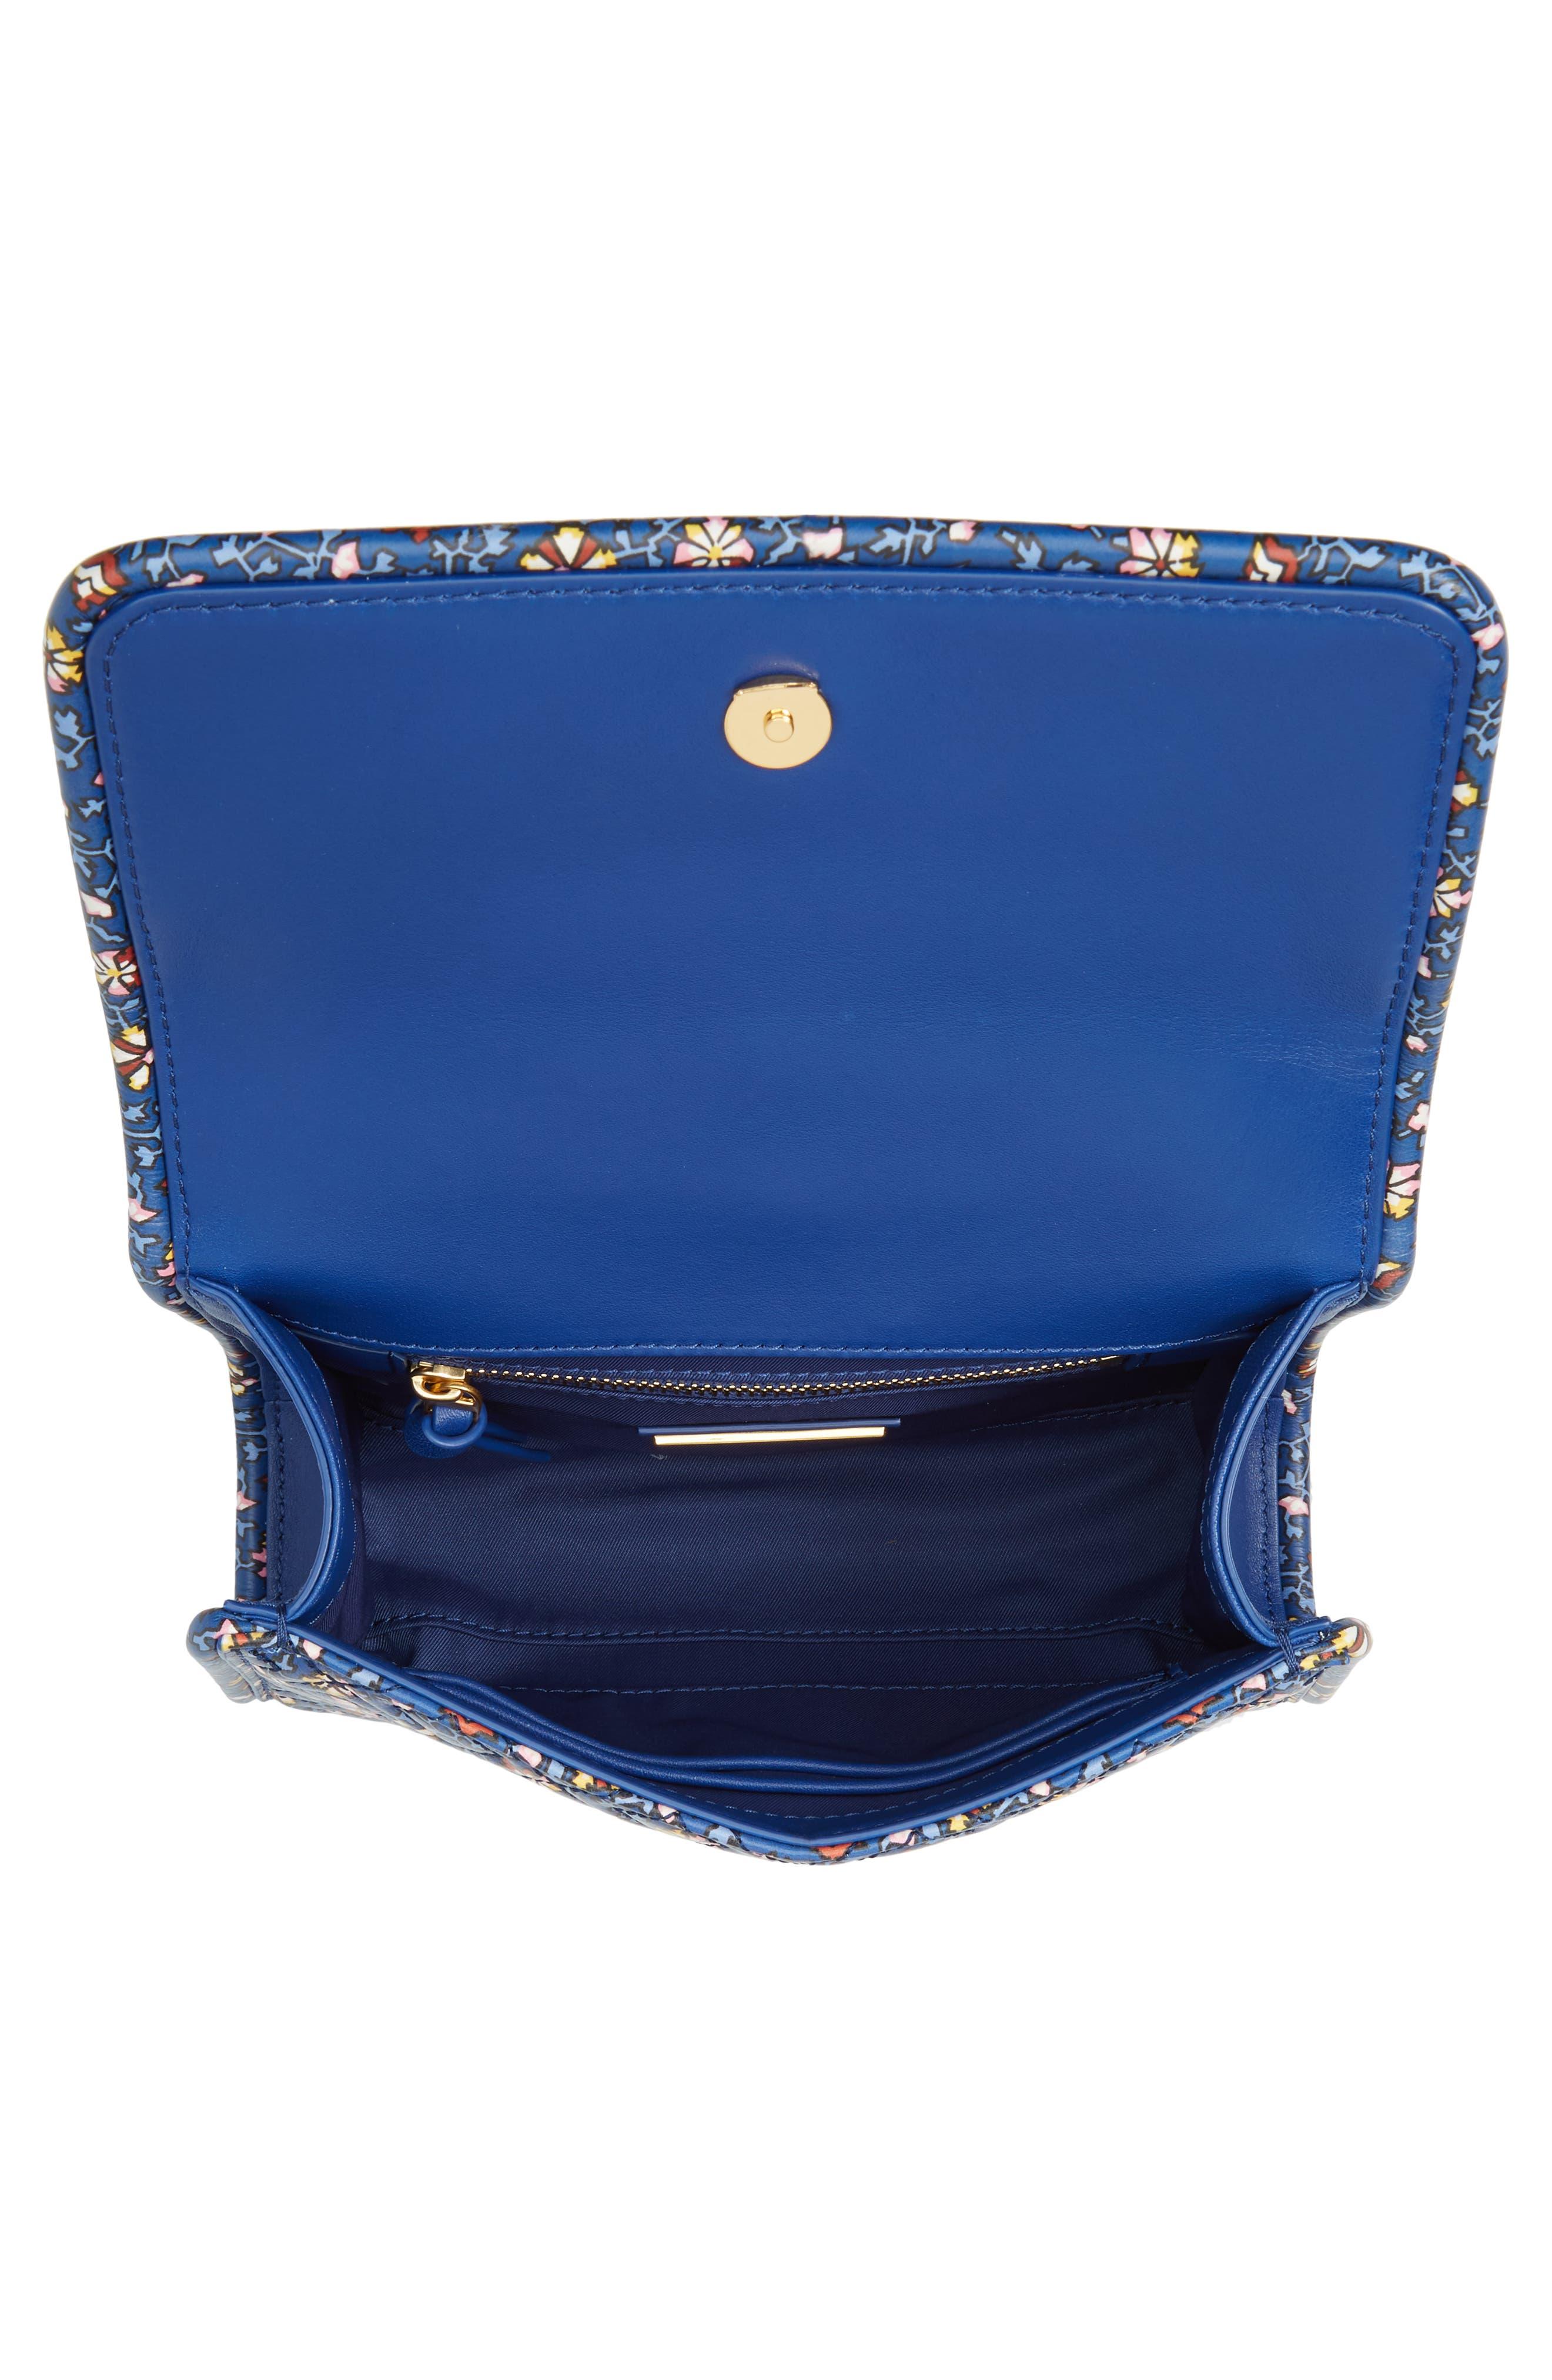 Fleming Print Leather Convertible Shoulder Bag,                             Alternate thumbnail 4, color,                             Blue Wild Pansy